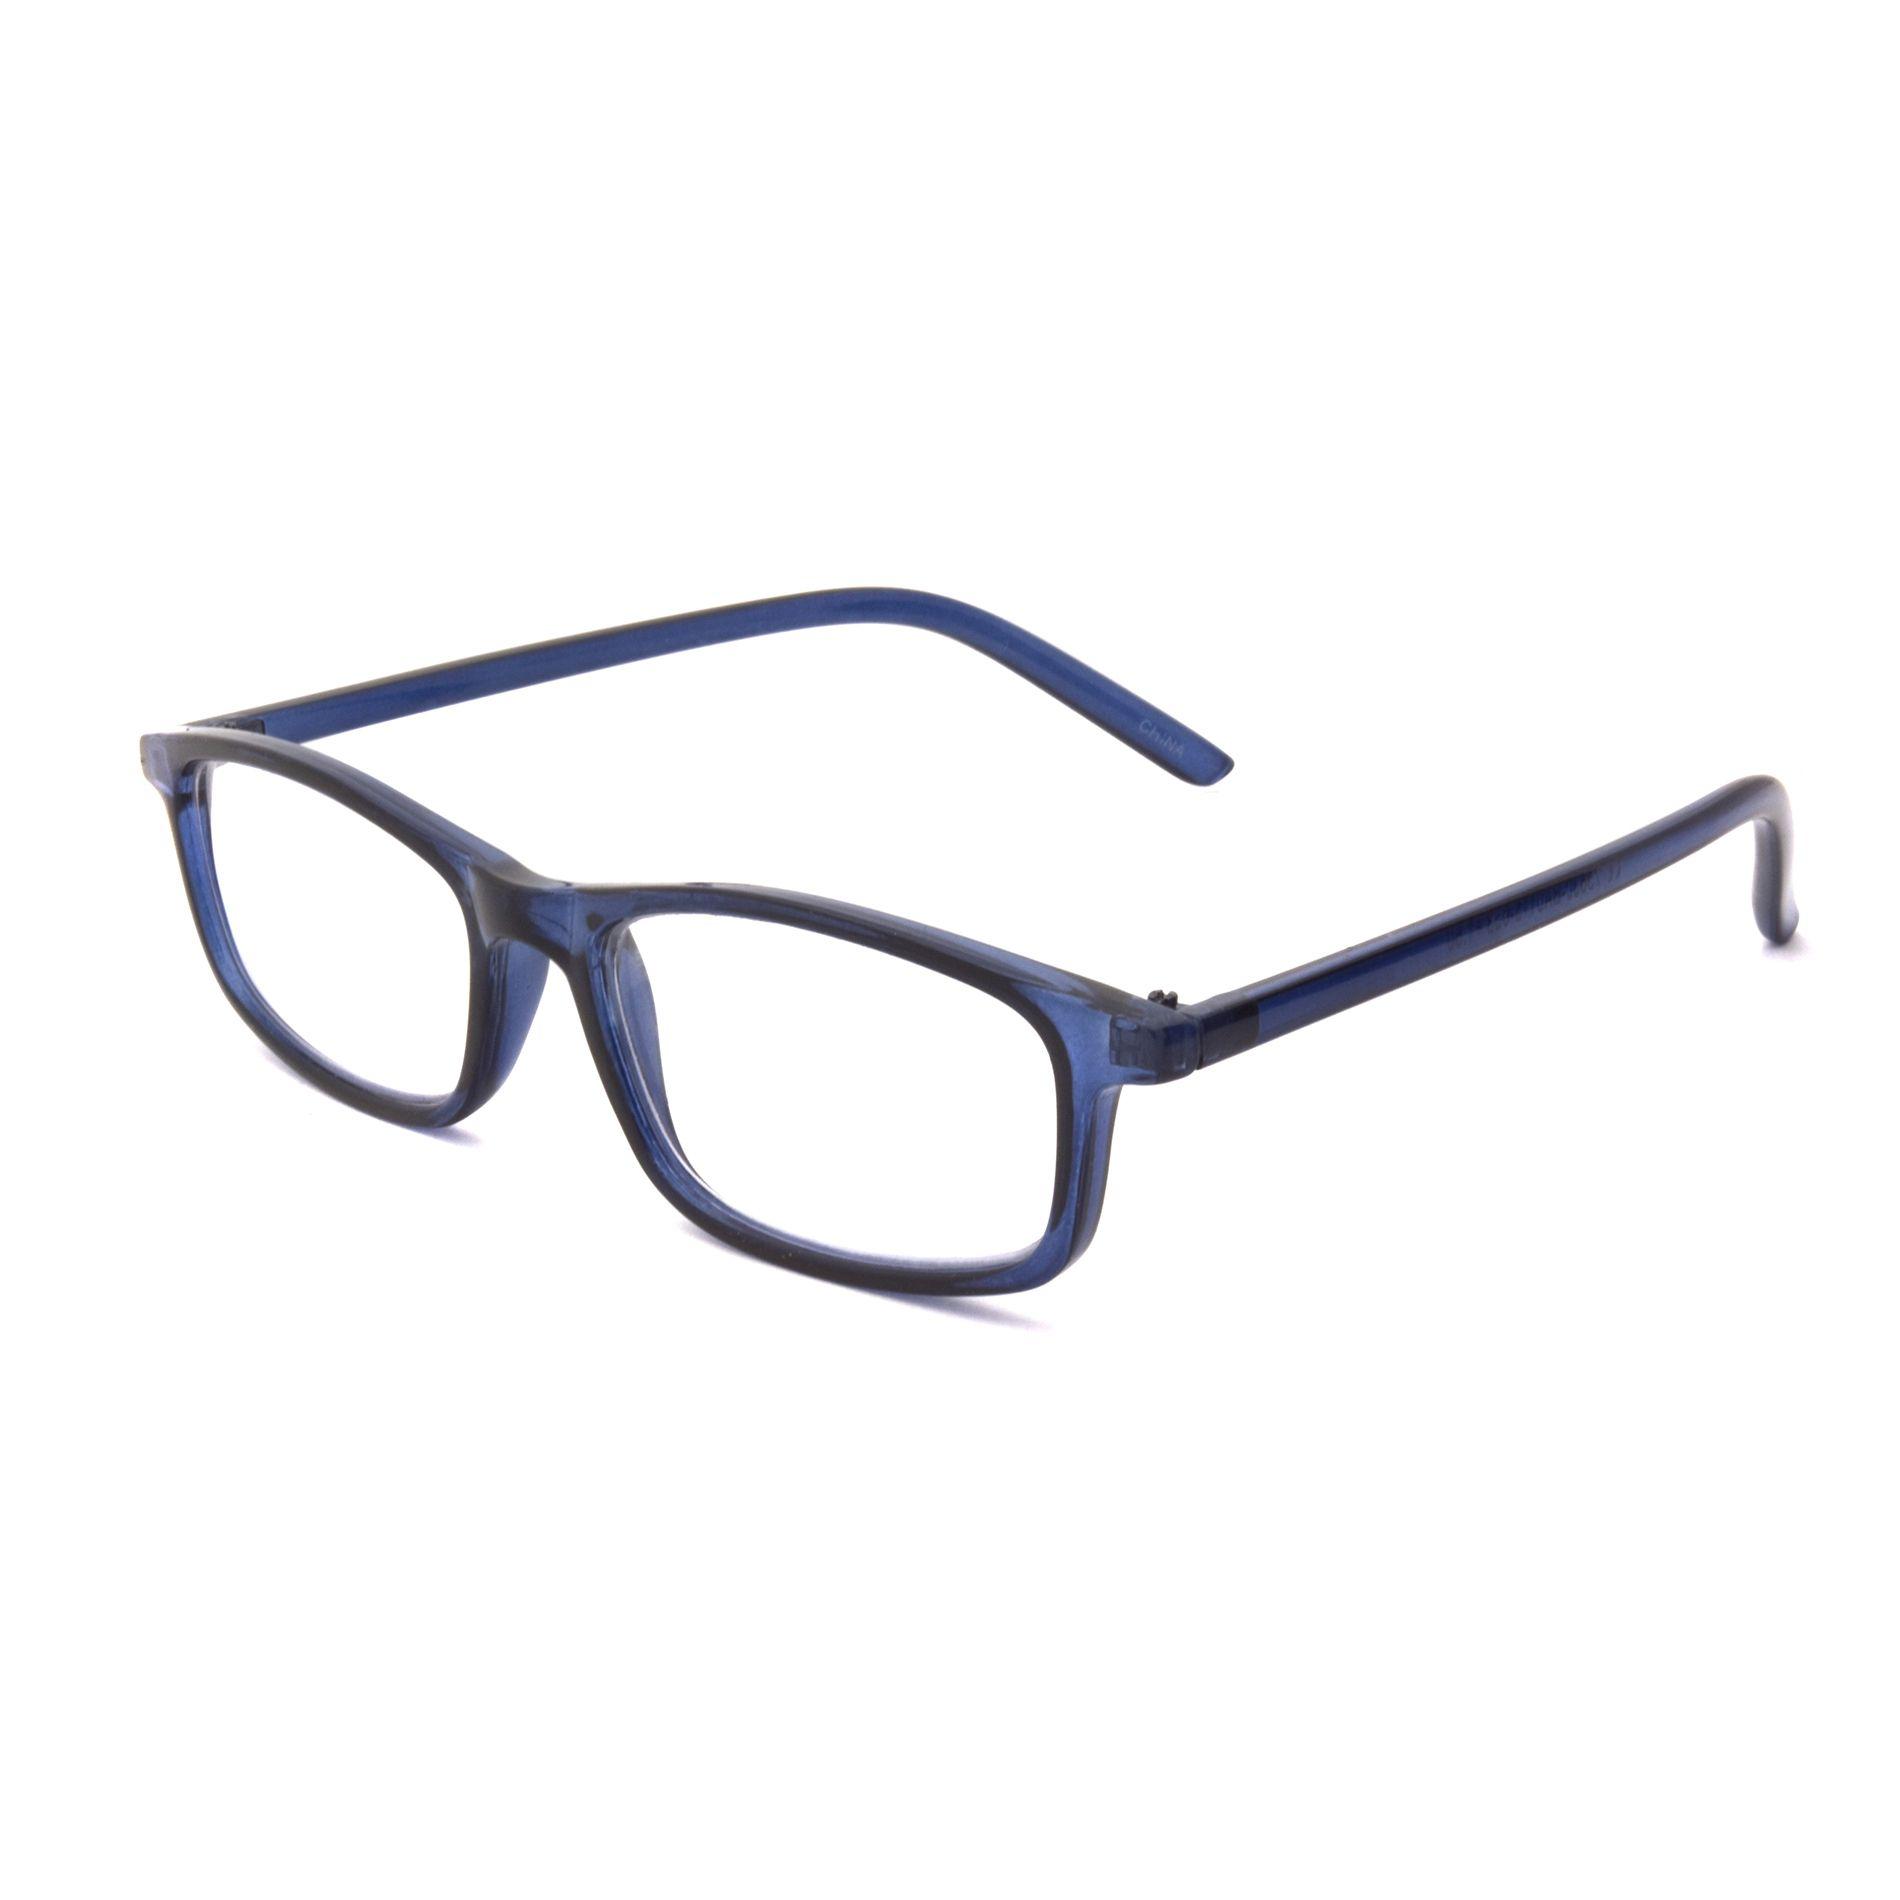 ICON EYEWEAR INC. Women's Reading Glasses +1.50